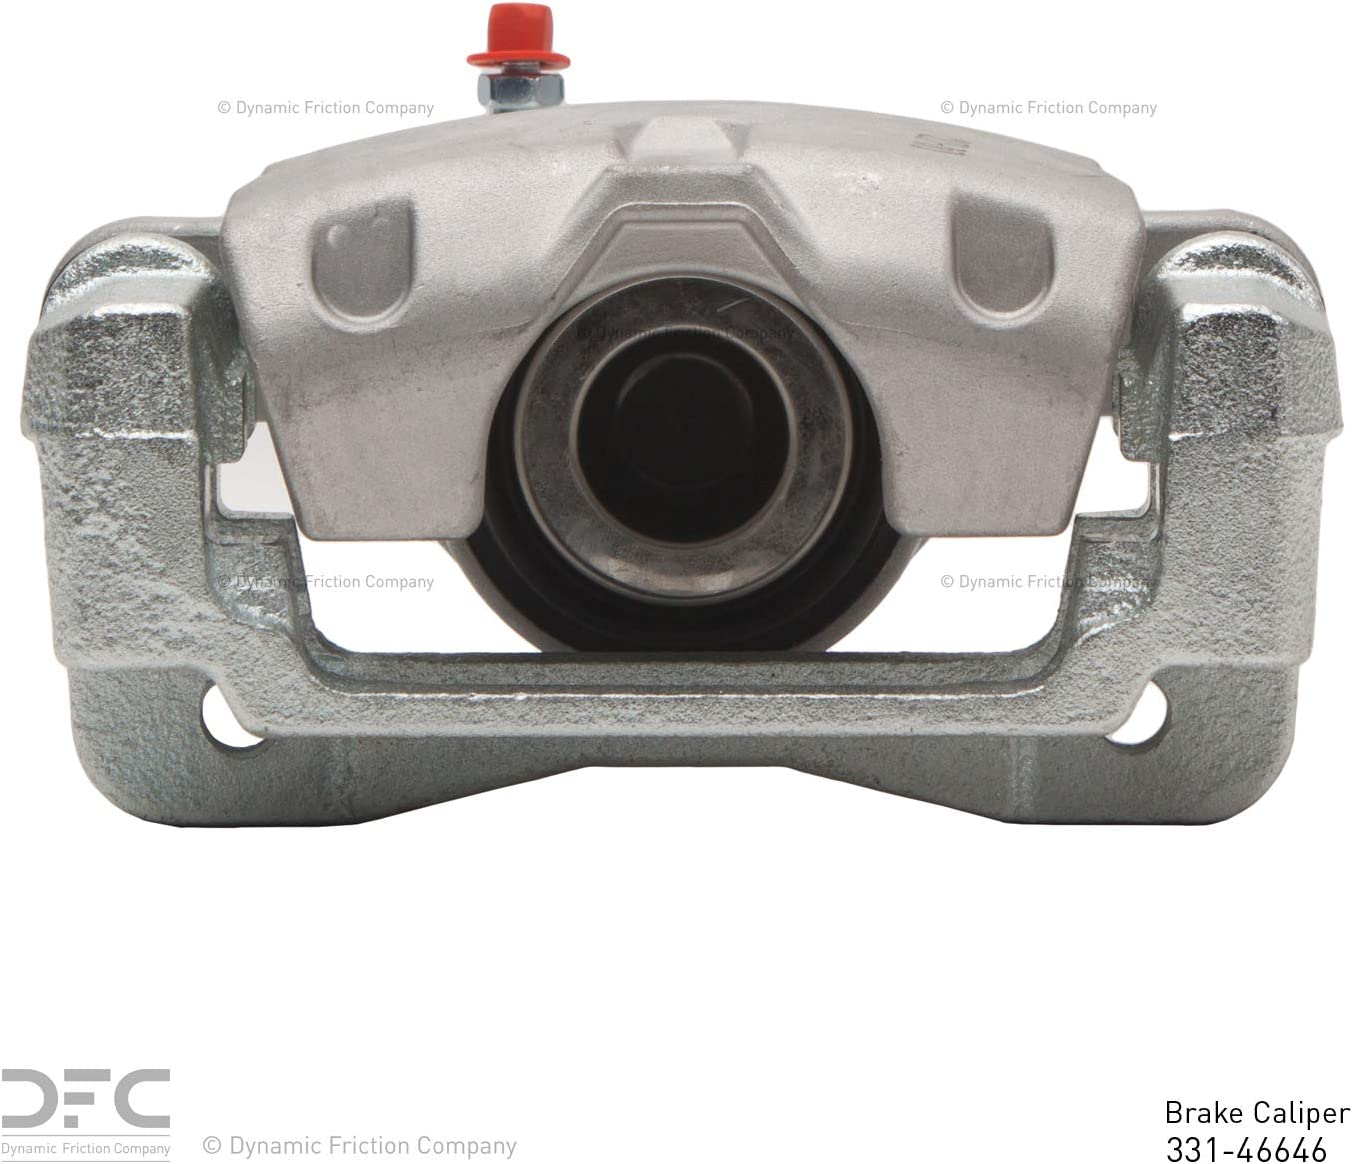 For 2004-2009 Cadillac SRX Rear Right Passenger Side Zinc Disc Brake Caliper